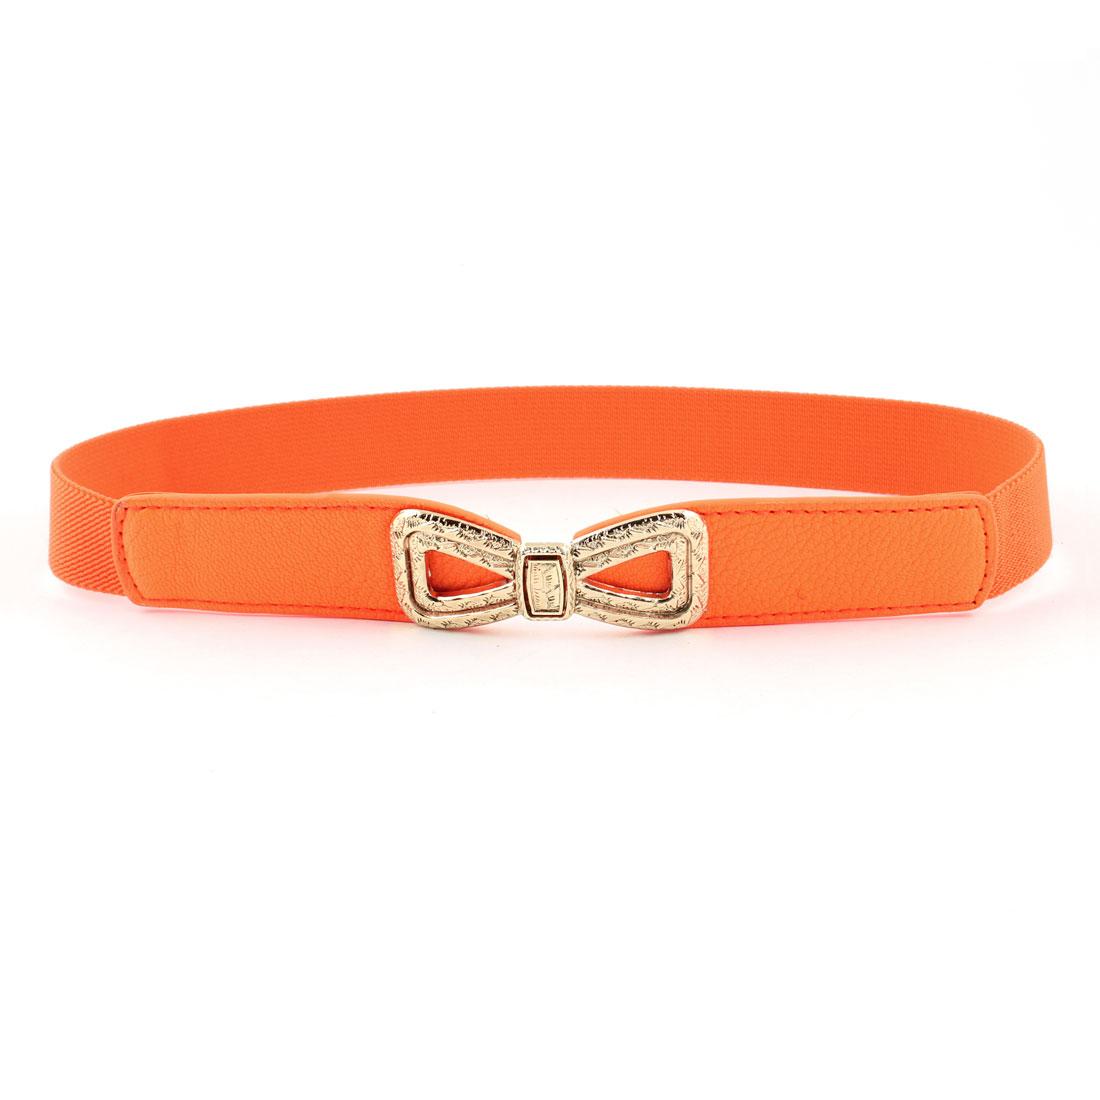 Ladies Embossment Interlock Buckle Stretchy Faux Leather Waist Belt Orange